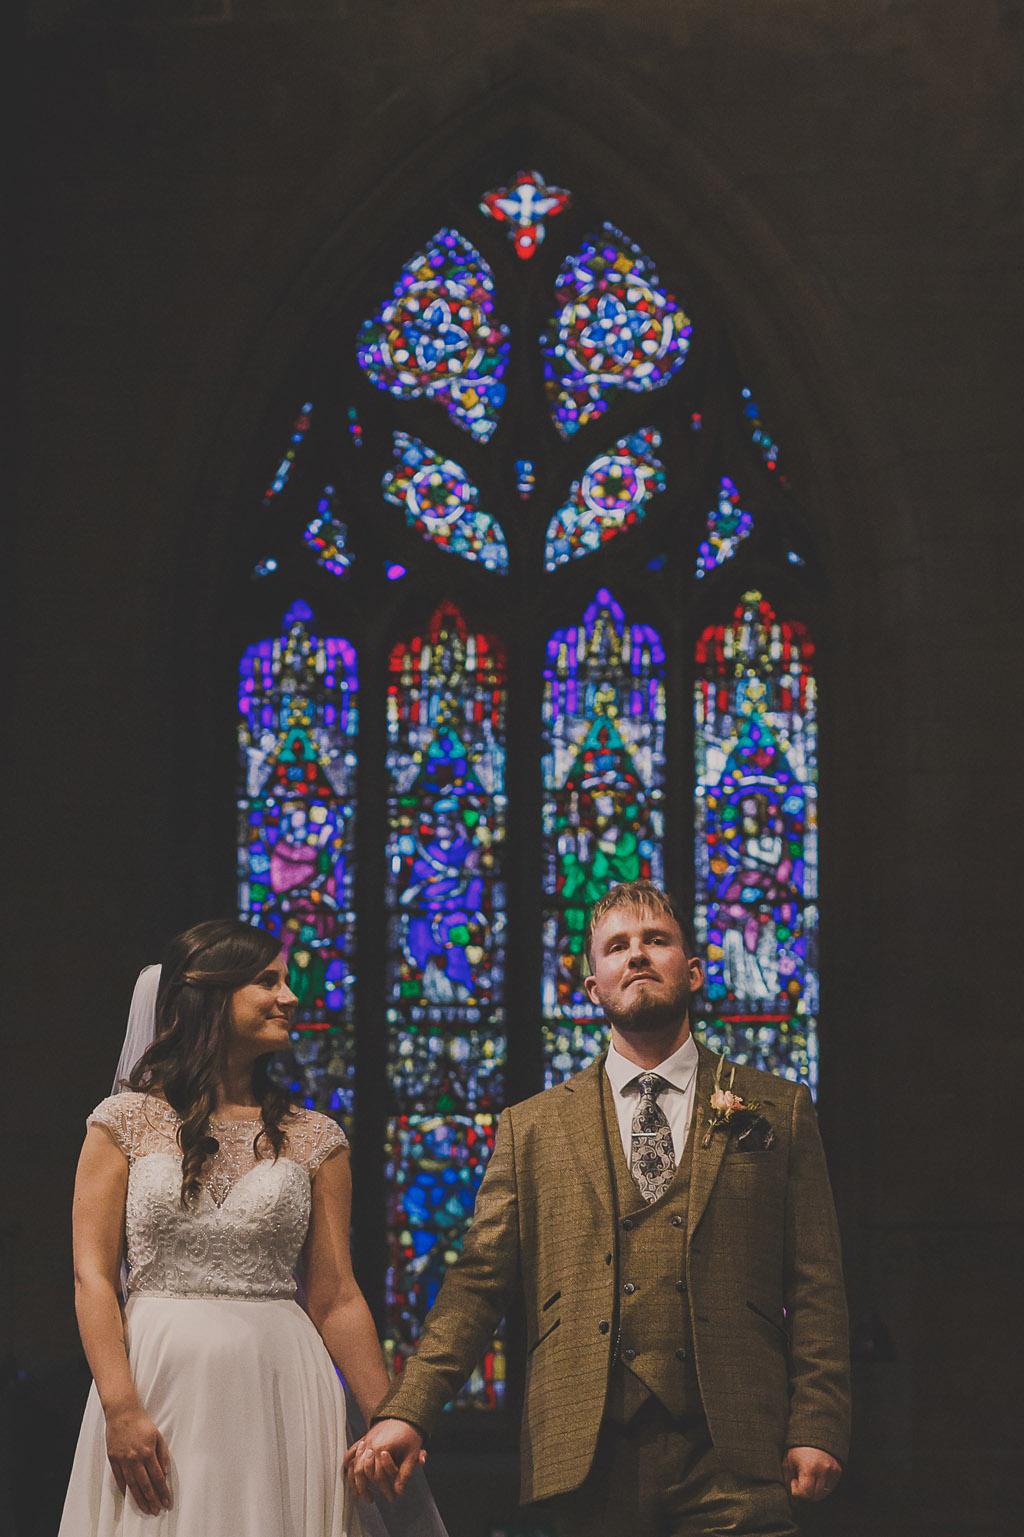 Neil Senior Photography Ltd Norfolk wedding photographer (5 of 6)